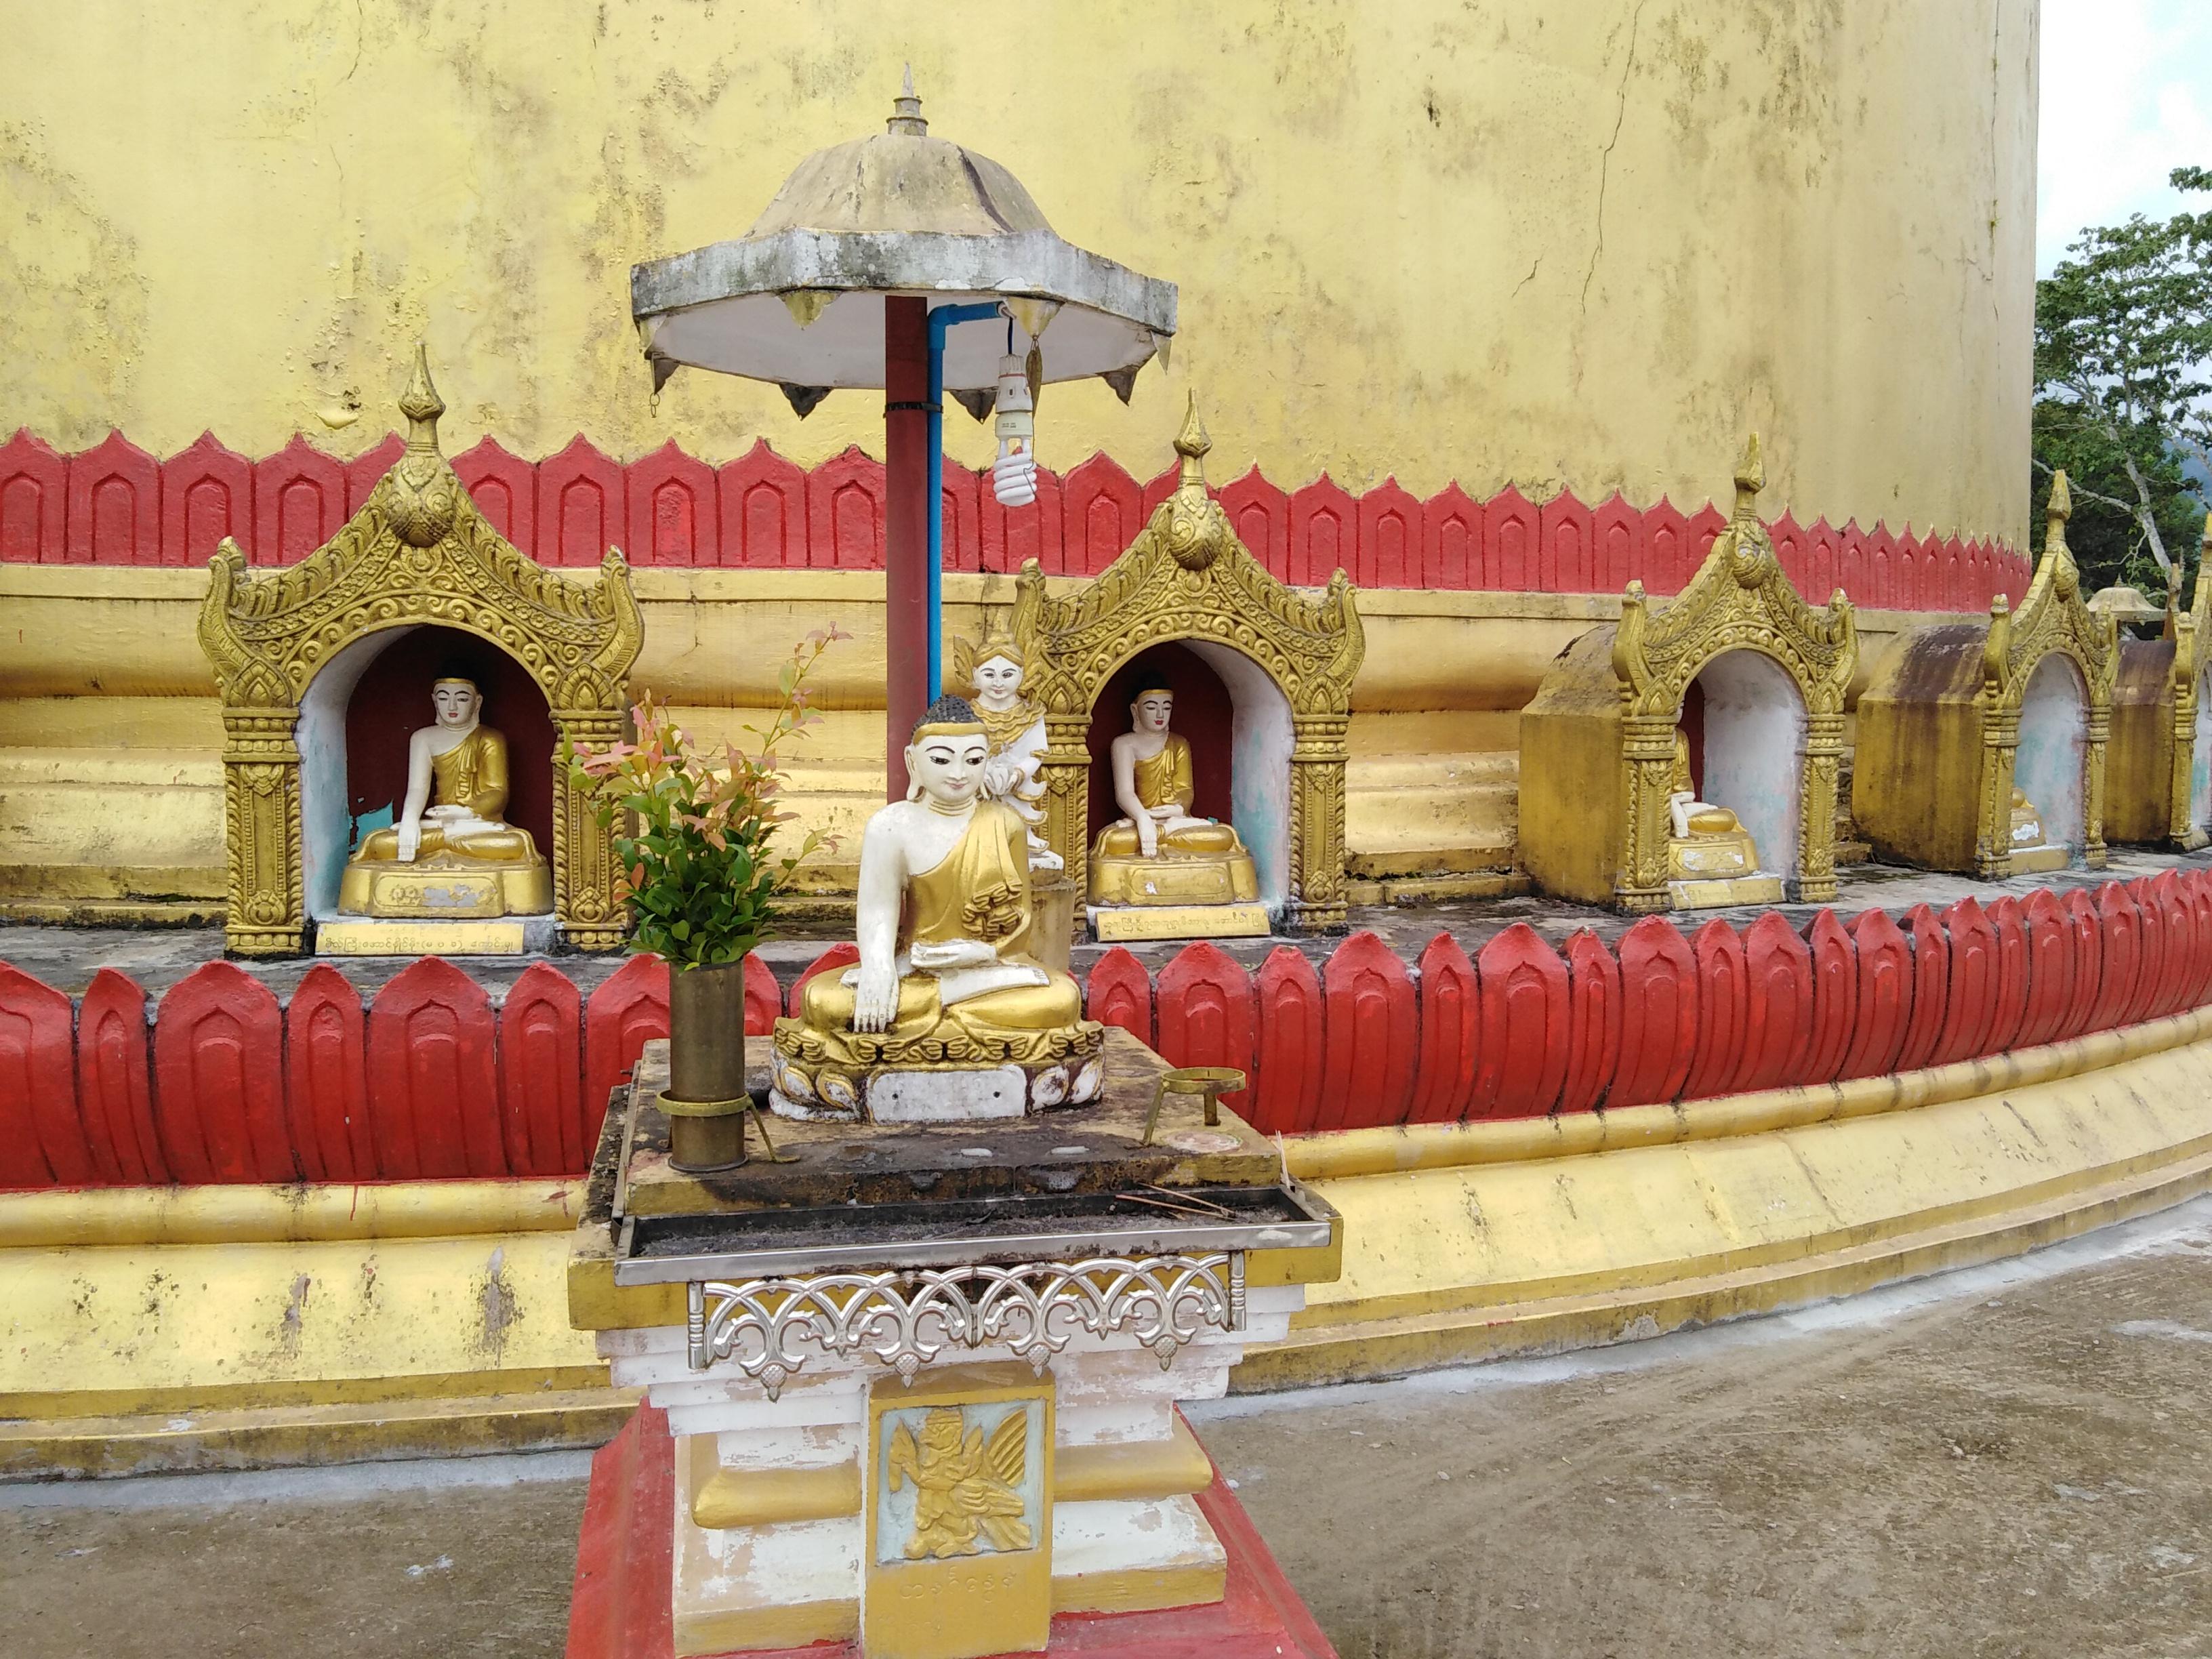 Myit Sone Pagoda